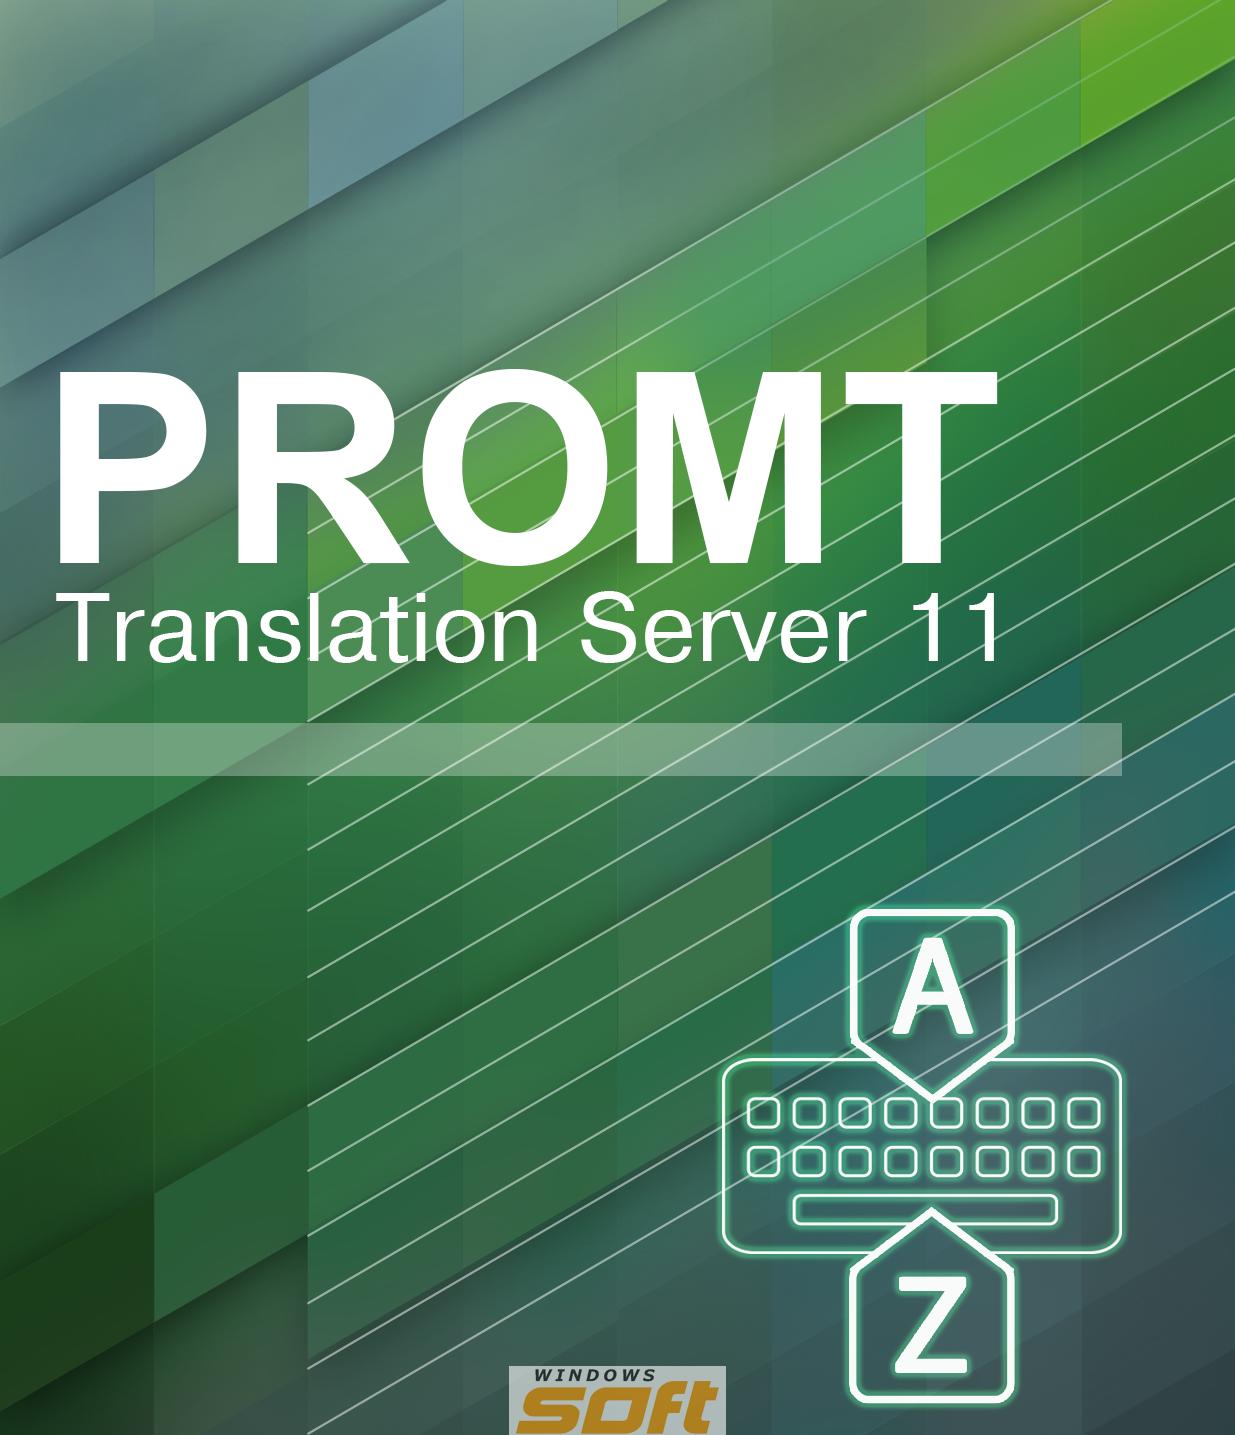 kupit-promt-translation-server-11-po-dostupnoy-tsene_alt